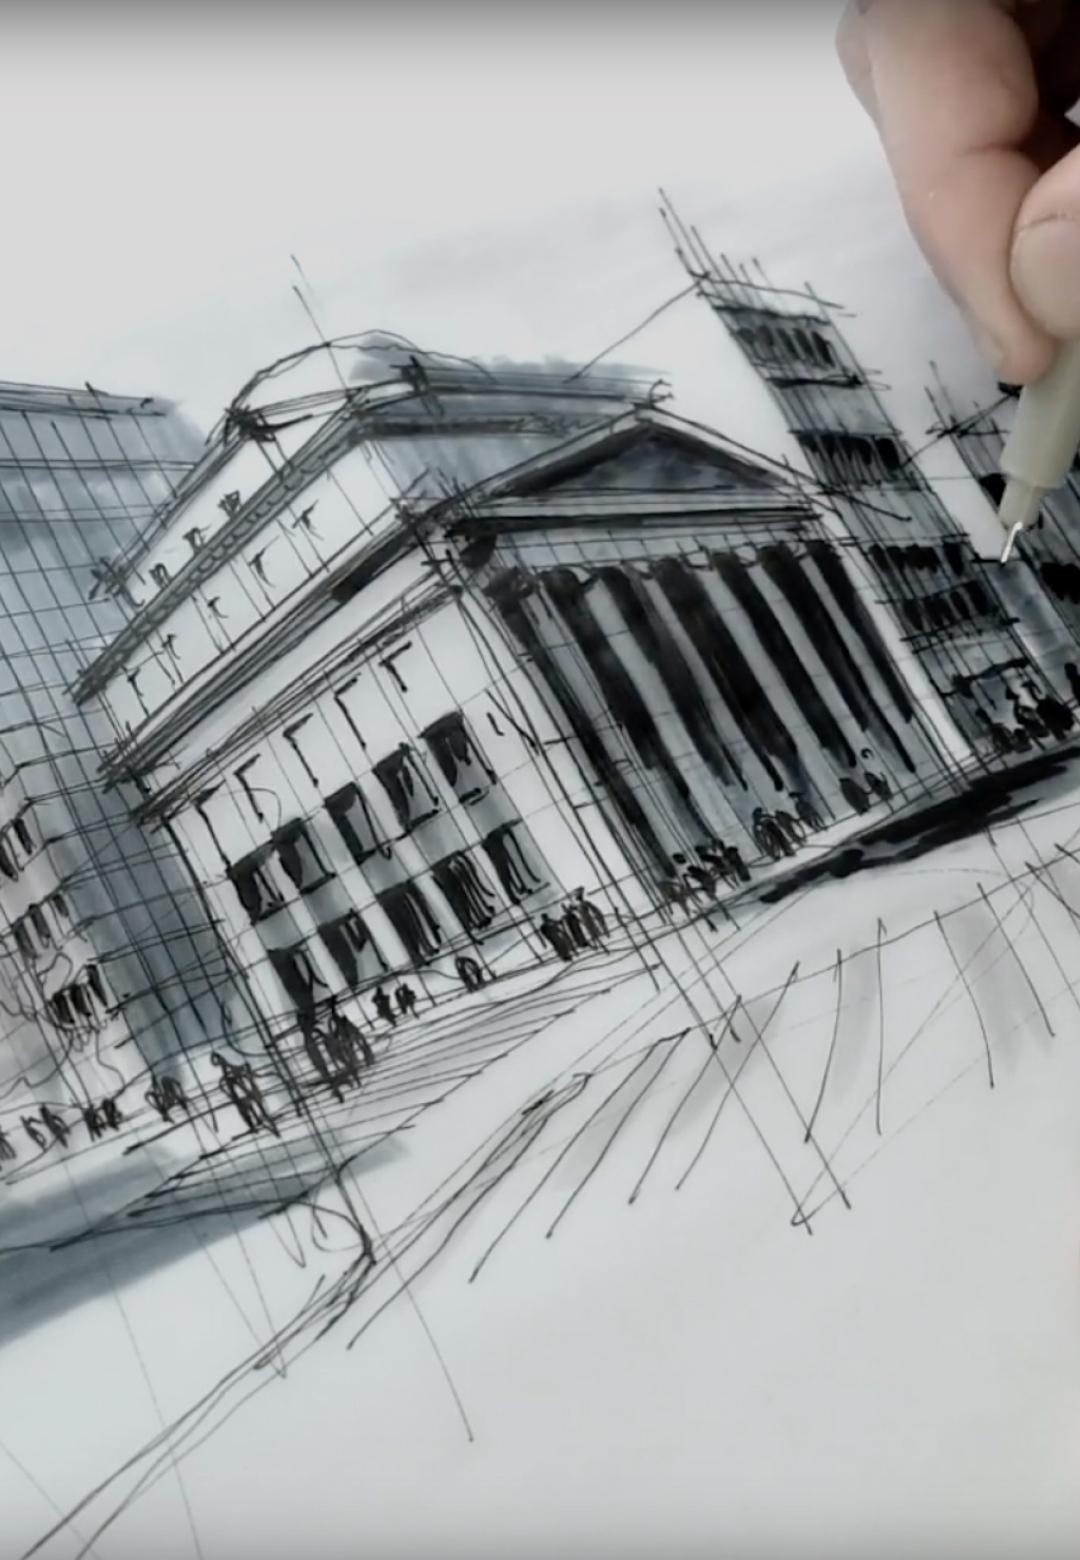 Sketching the Icecream Museum, San Francisco | Dan Hogman | STIRworld